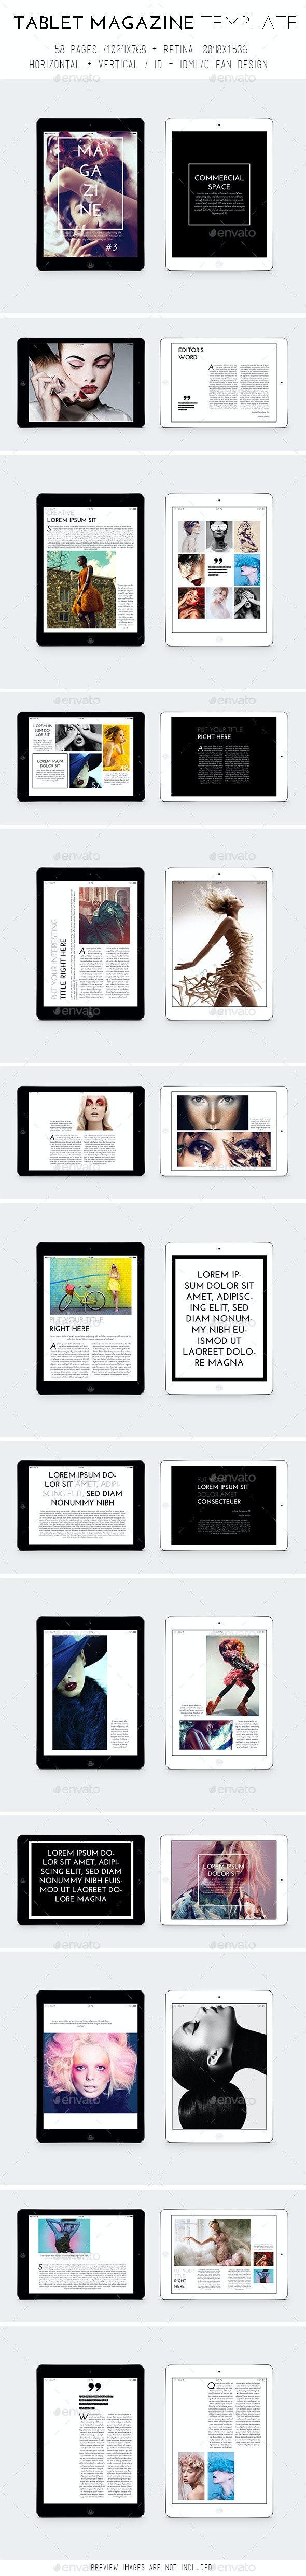 iPad & Tablet Magazine Template - Digital Magazines ePublishing